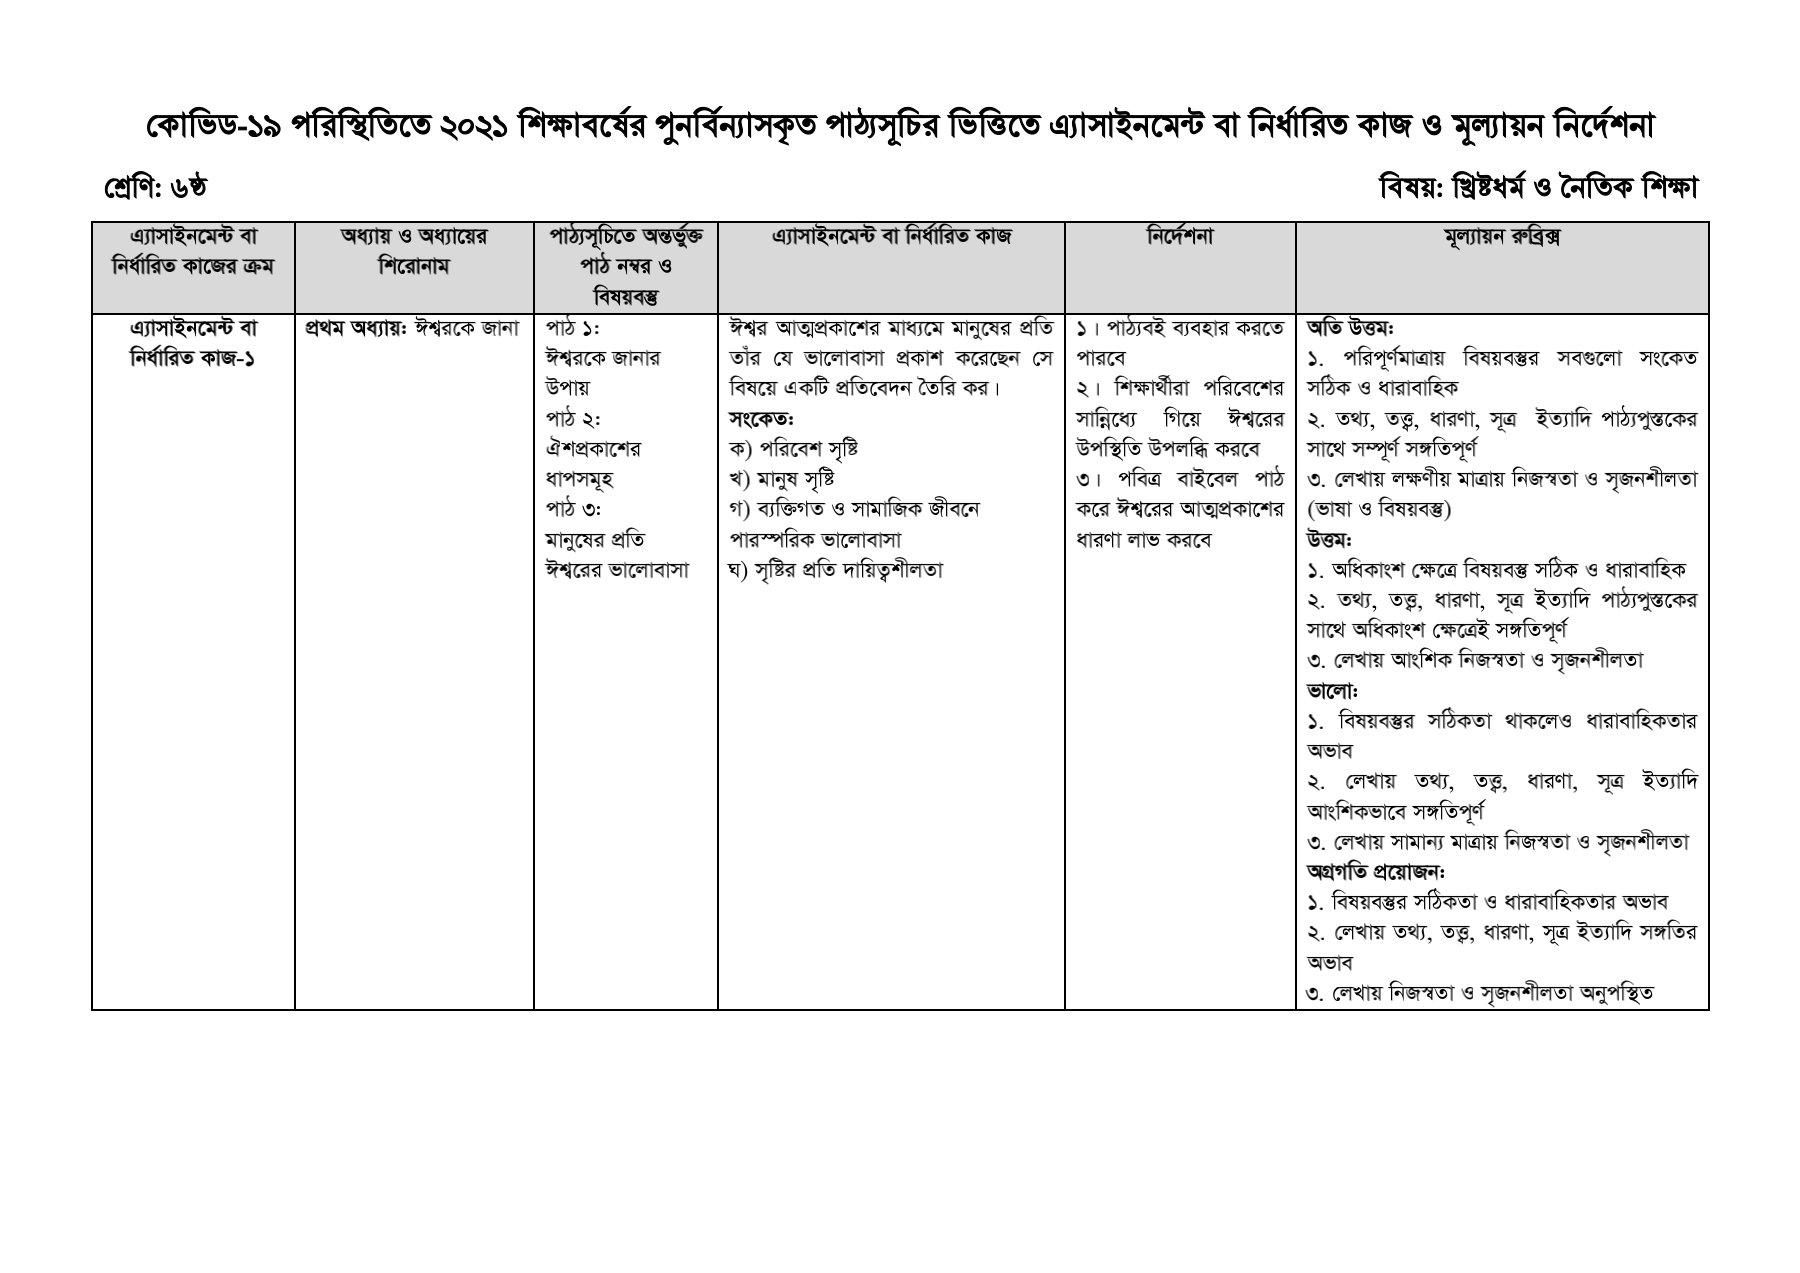 Class 6 1st Assignment Solution 2021   | ৭ম/সপ্তম শ্রেণীর এসাইনমেন্ট উত্তর/সমাধান ২০২১